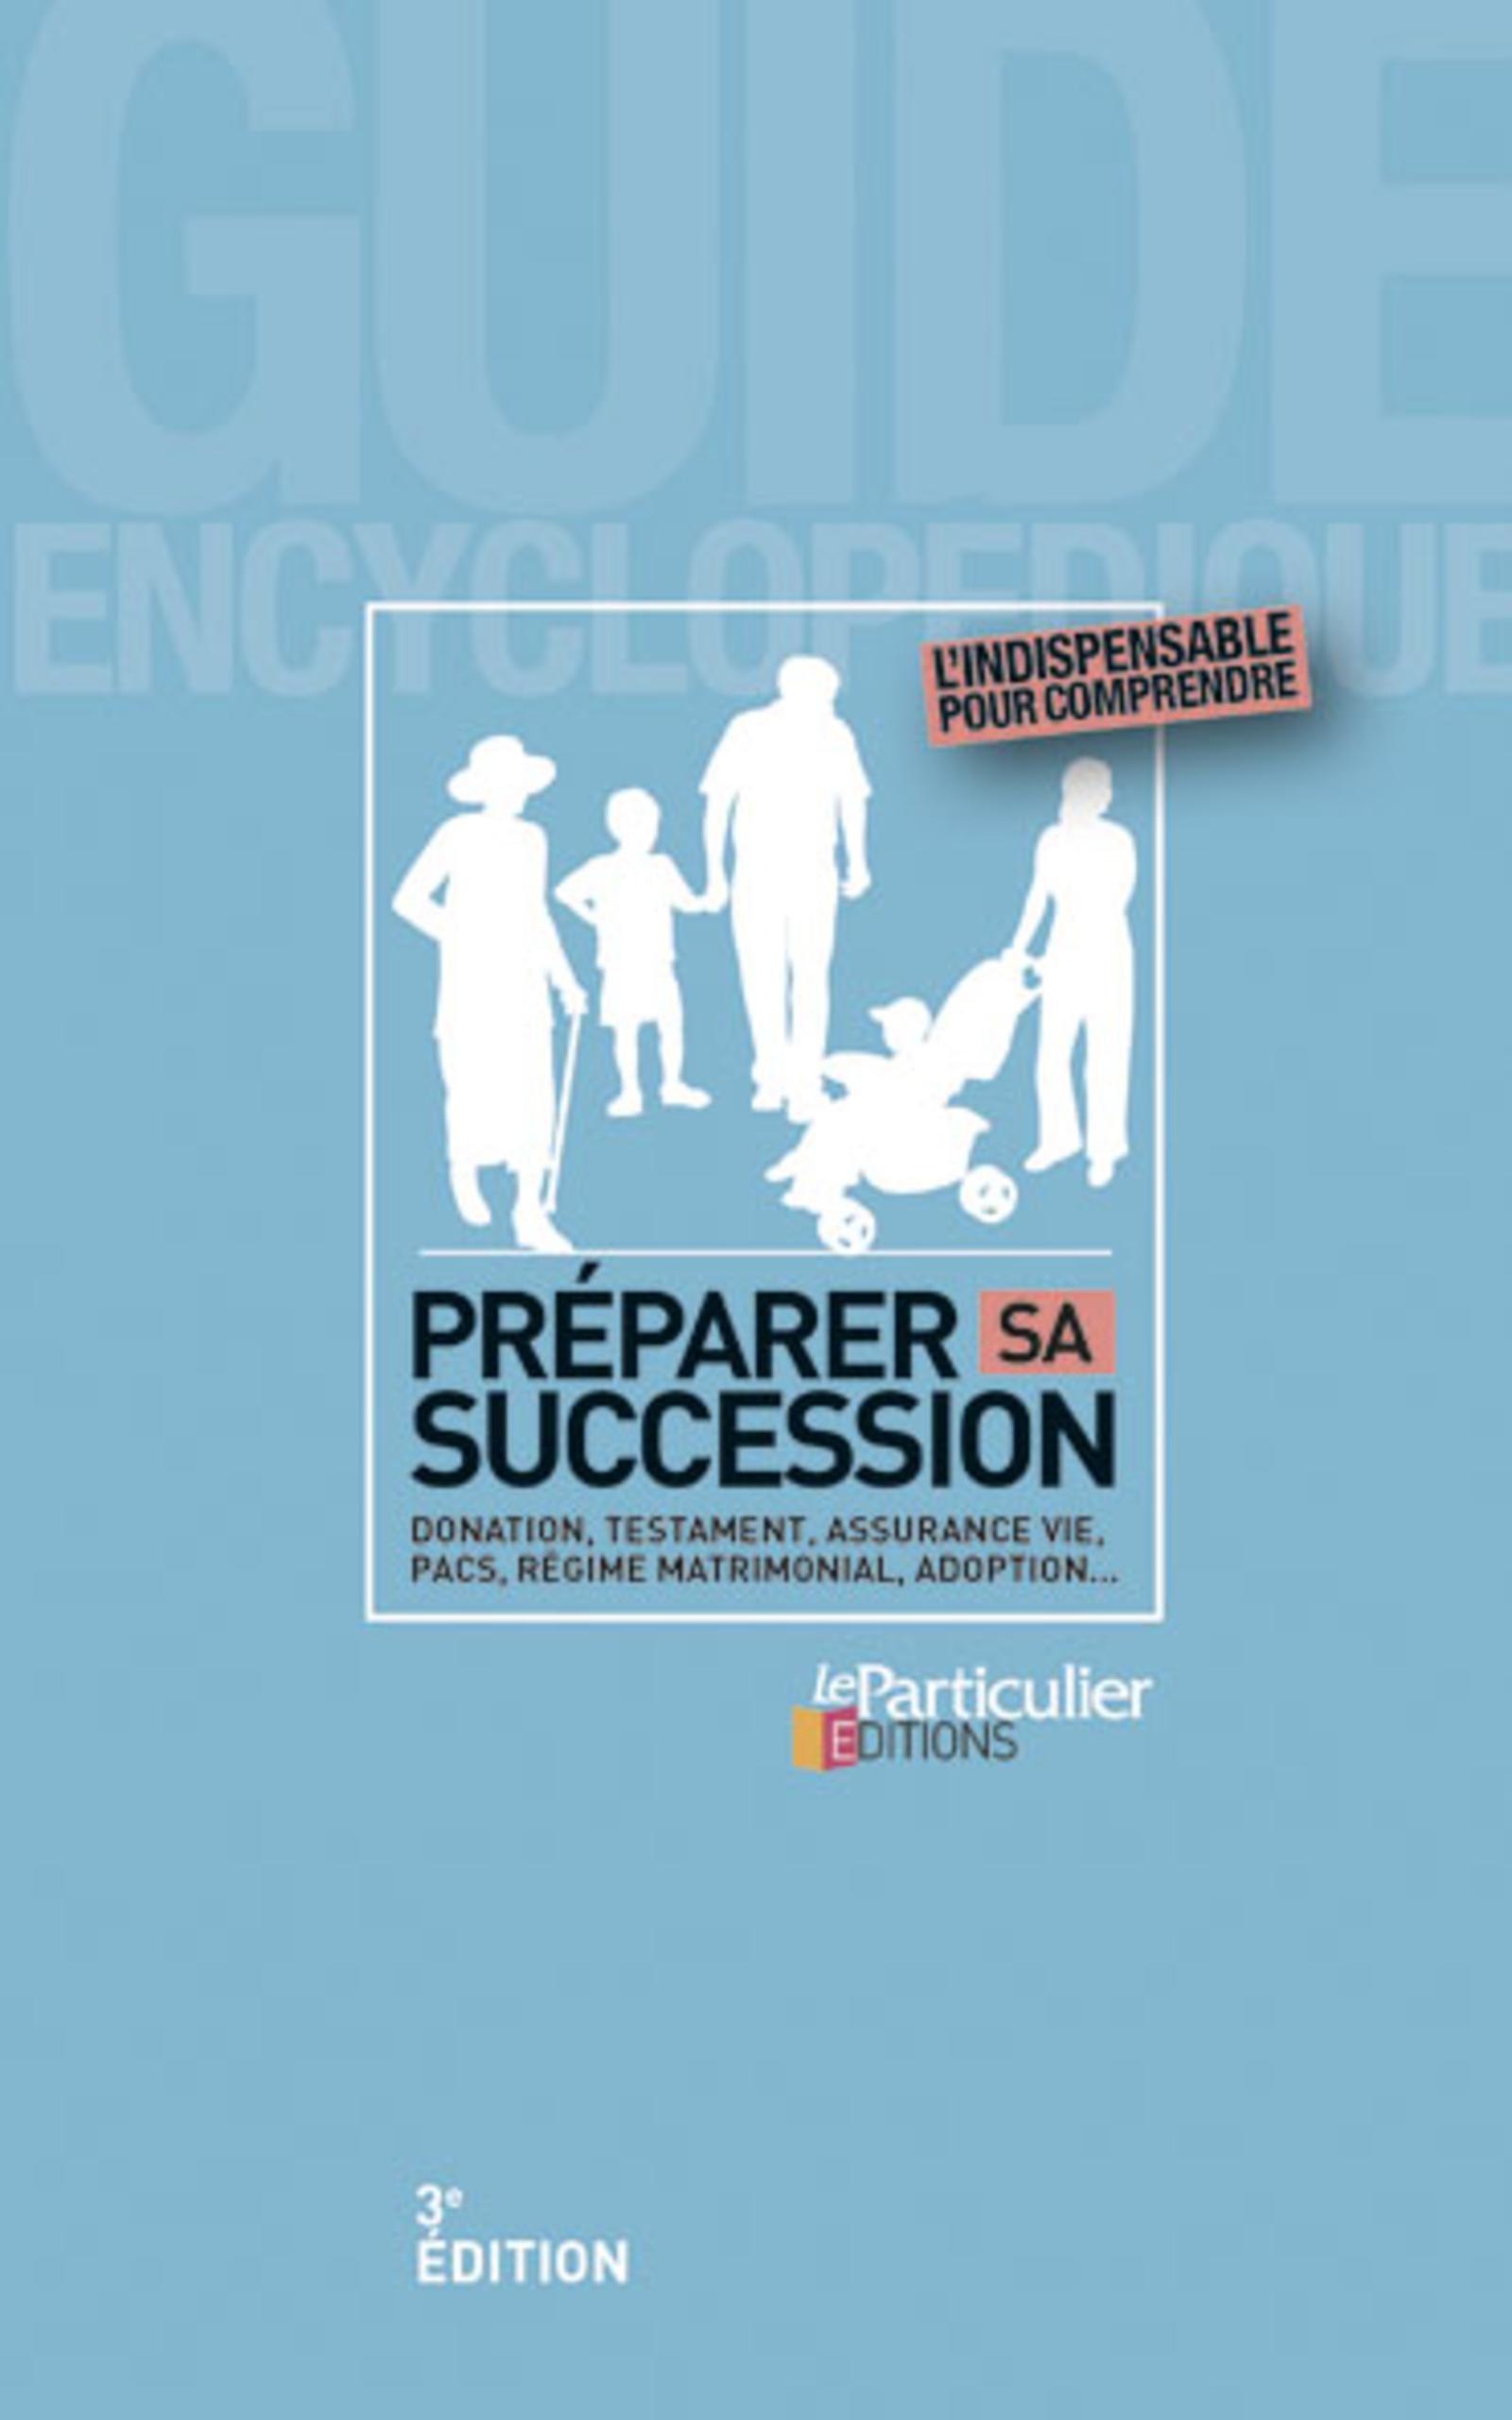 PREPARER SA SUCCESSION DONATION TESTAMENT ASSURNCE VIE PACS REGIME MATRIMONIAL A - DONATIONS, TESTAT